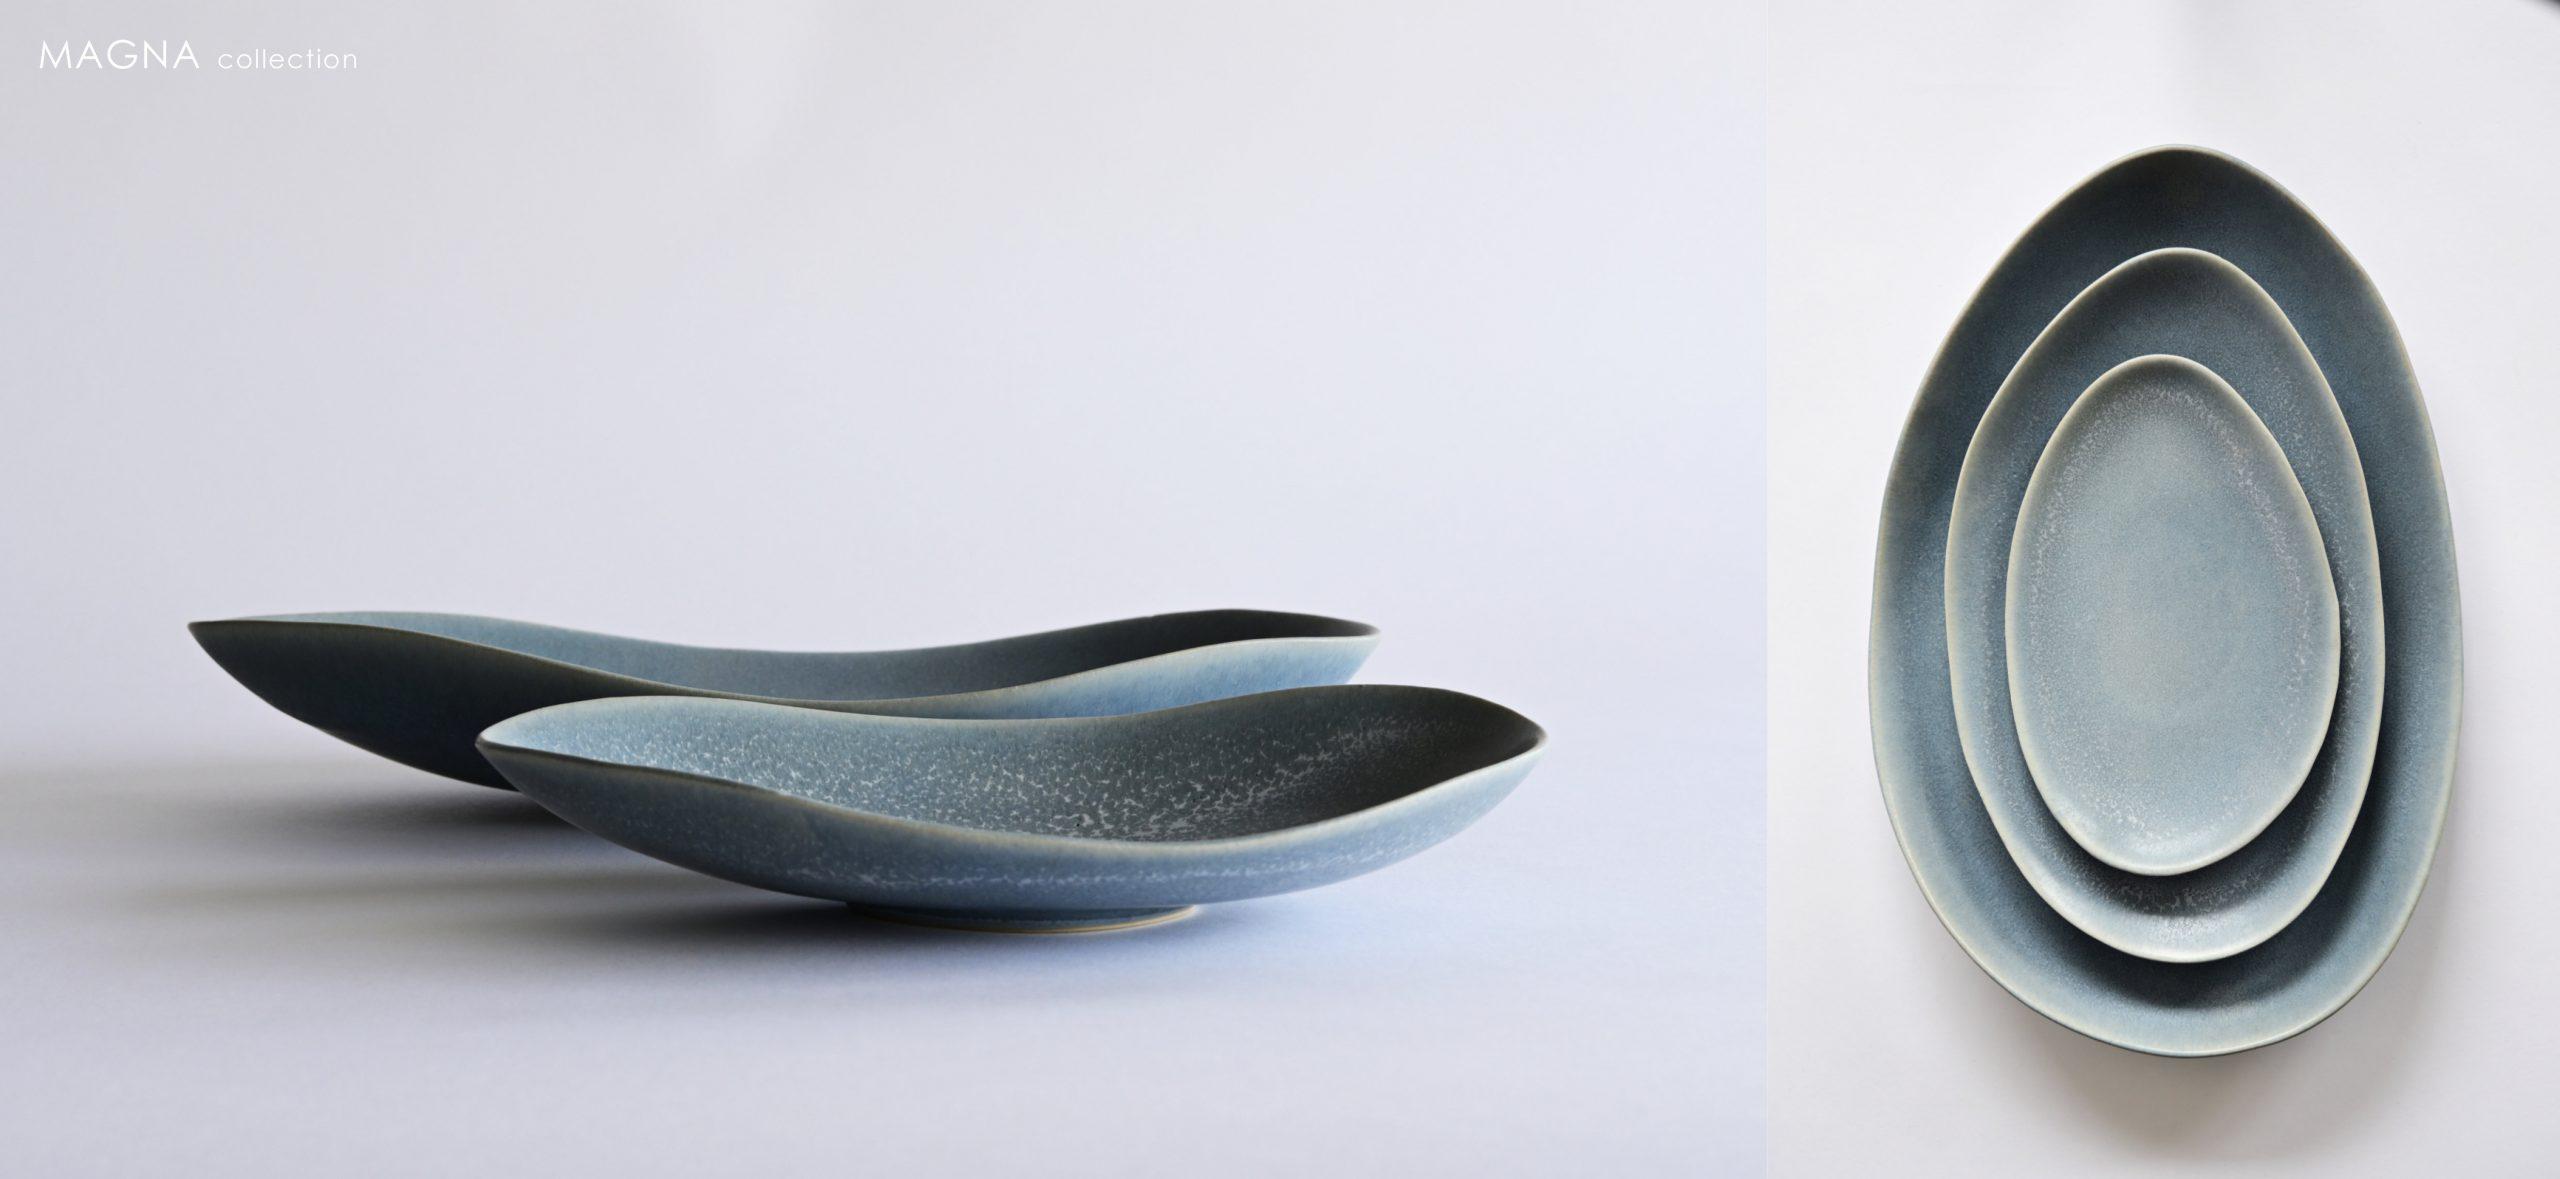 valdosol-porcelanic-magna